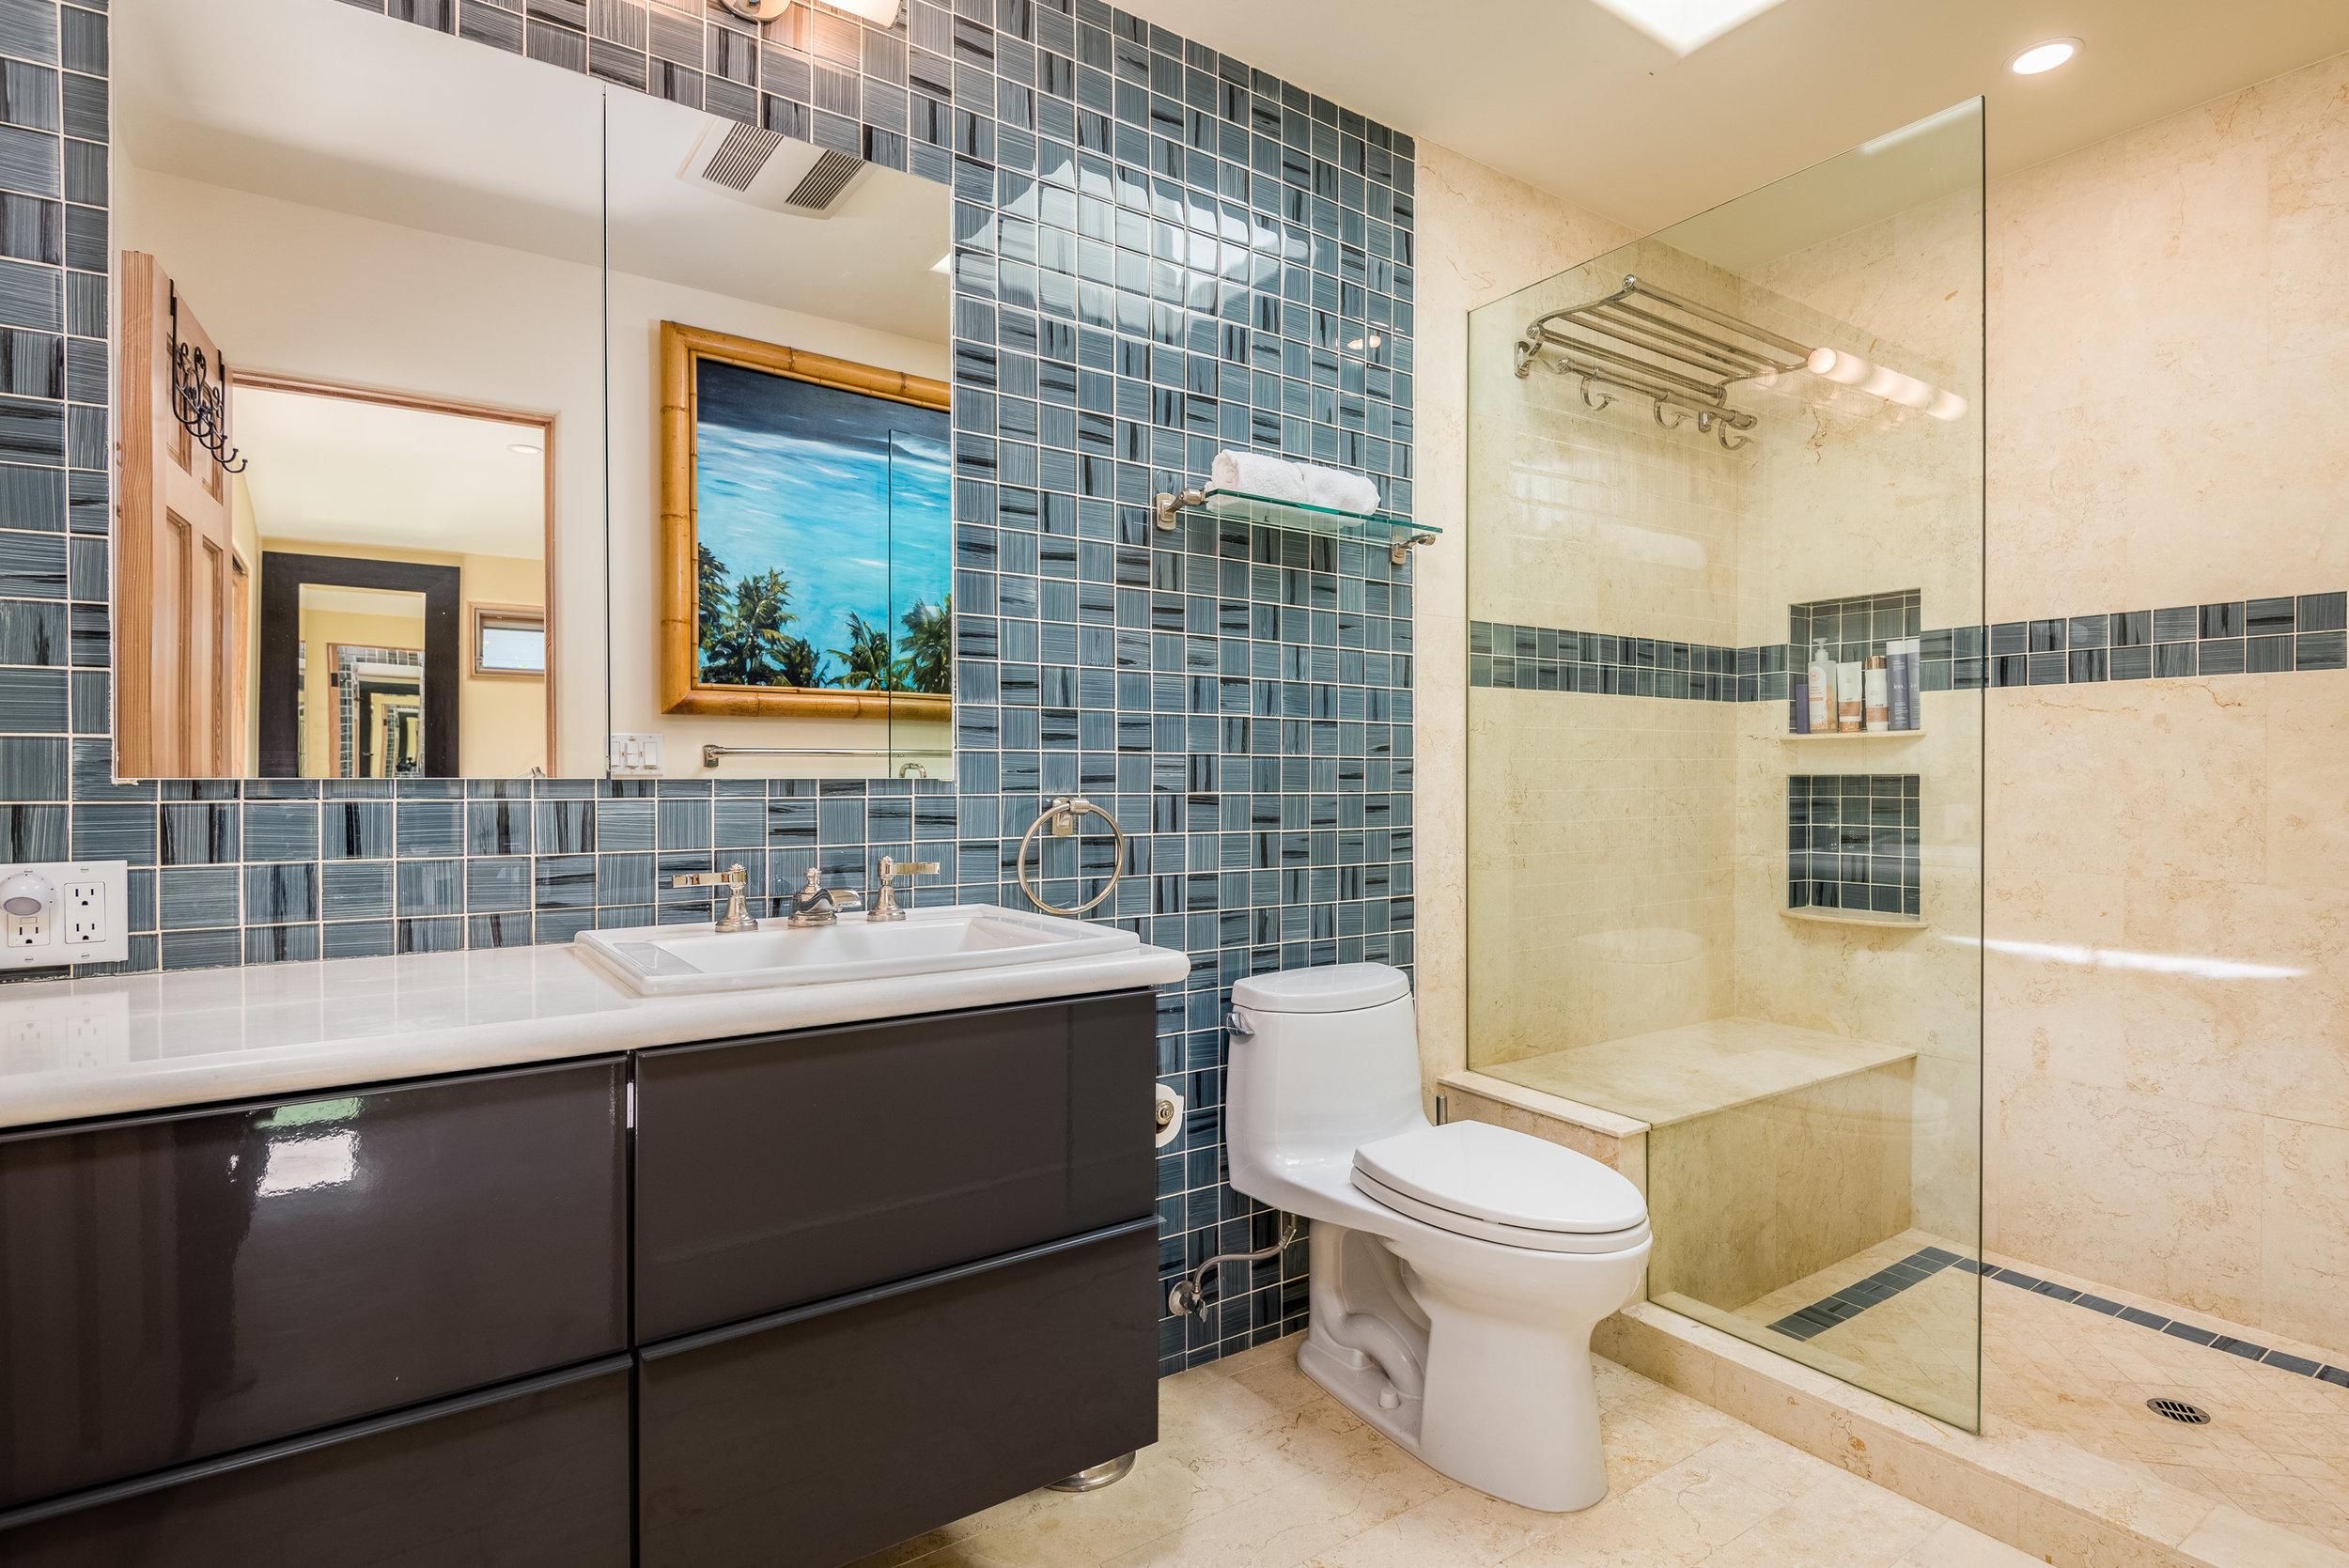 17-Master Bathroom.jpg